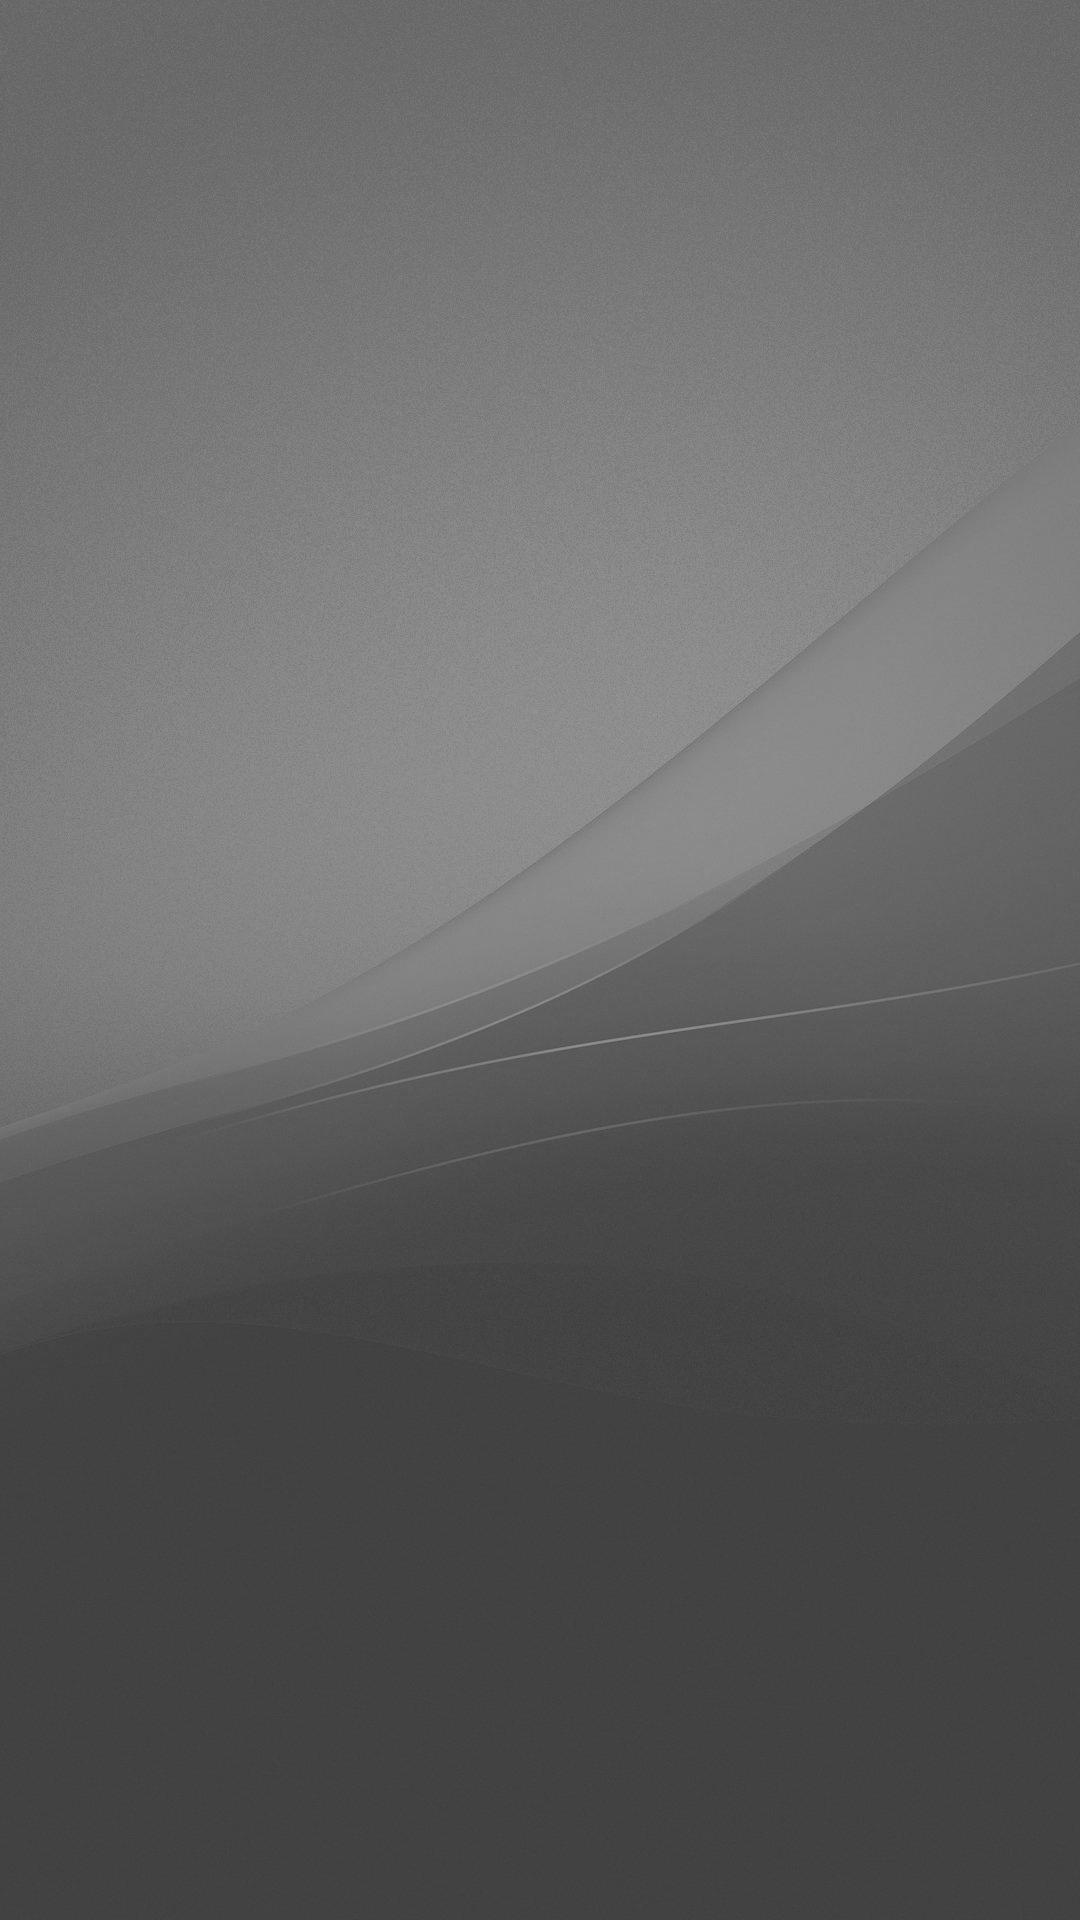 Android Lollipop Wallpaper Hd 1080p Xperia Lollipop Grey Wallpaper Gizmo Bolt Exposing